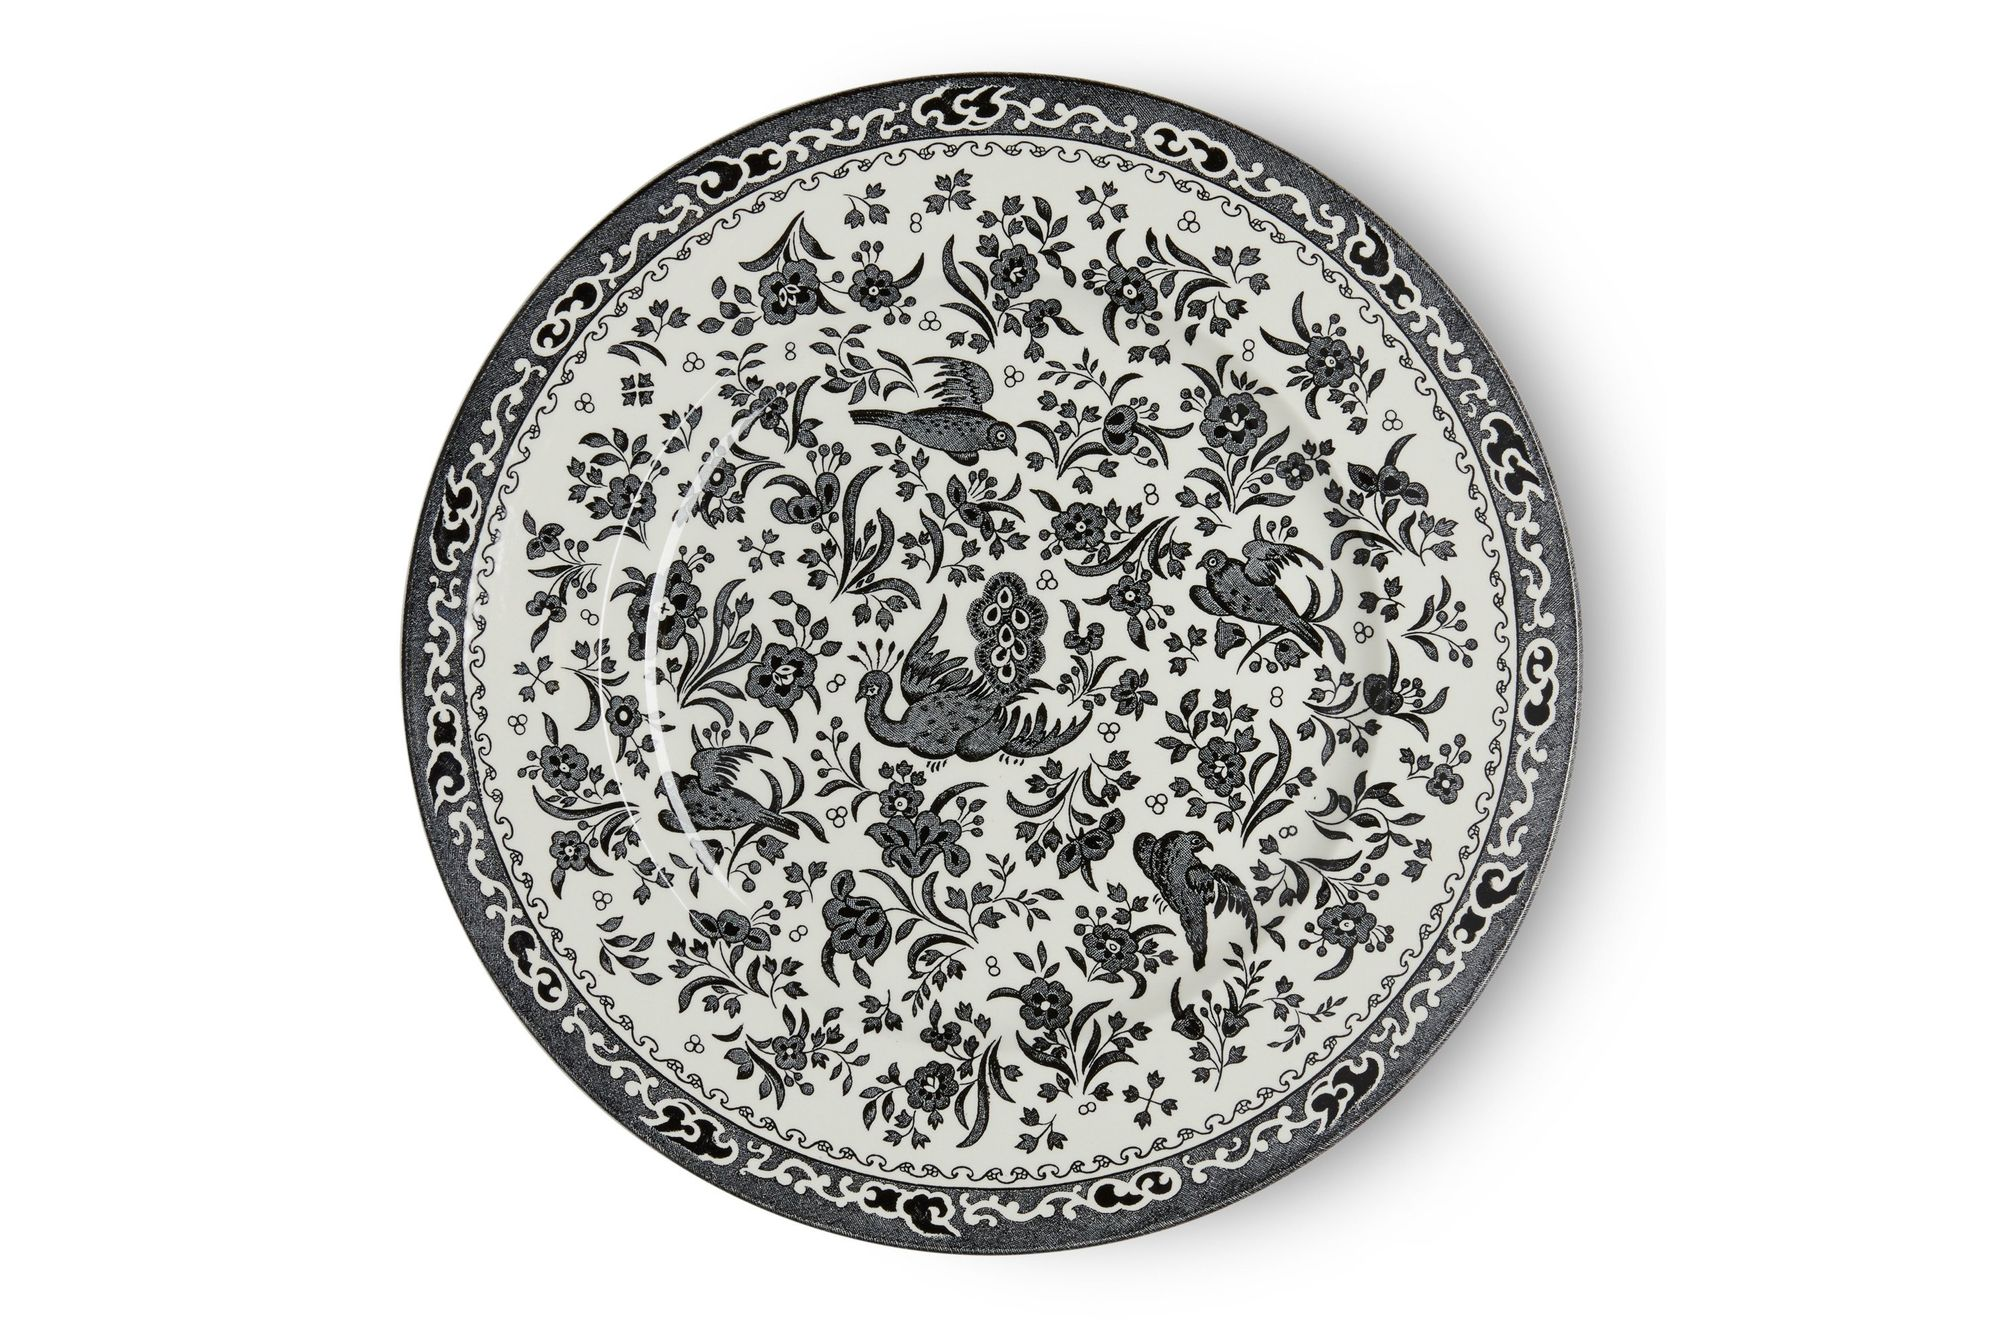 Burleigh Black Regal Peacock Dinner Plate 25cm thumb 1